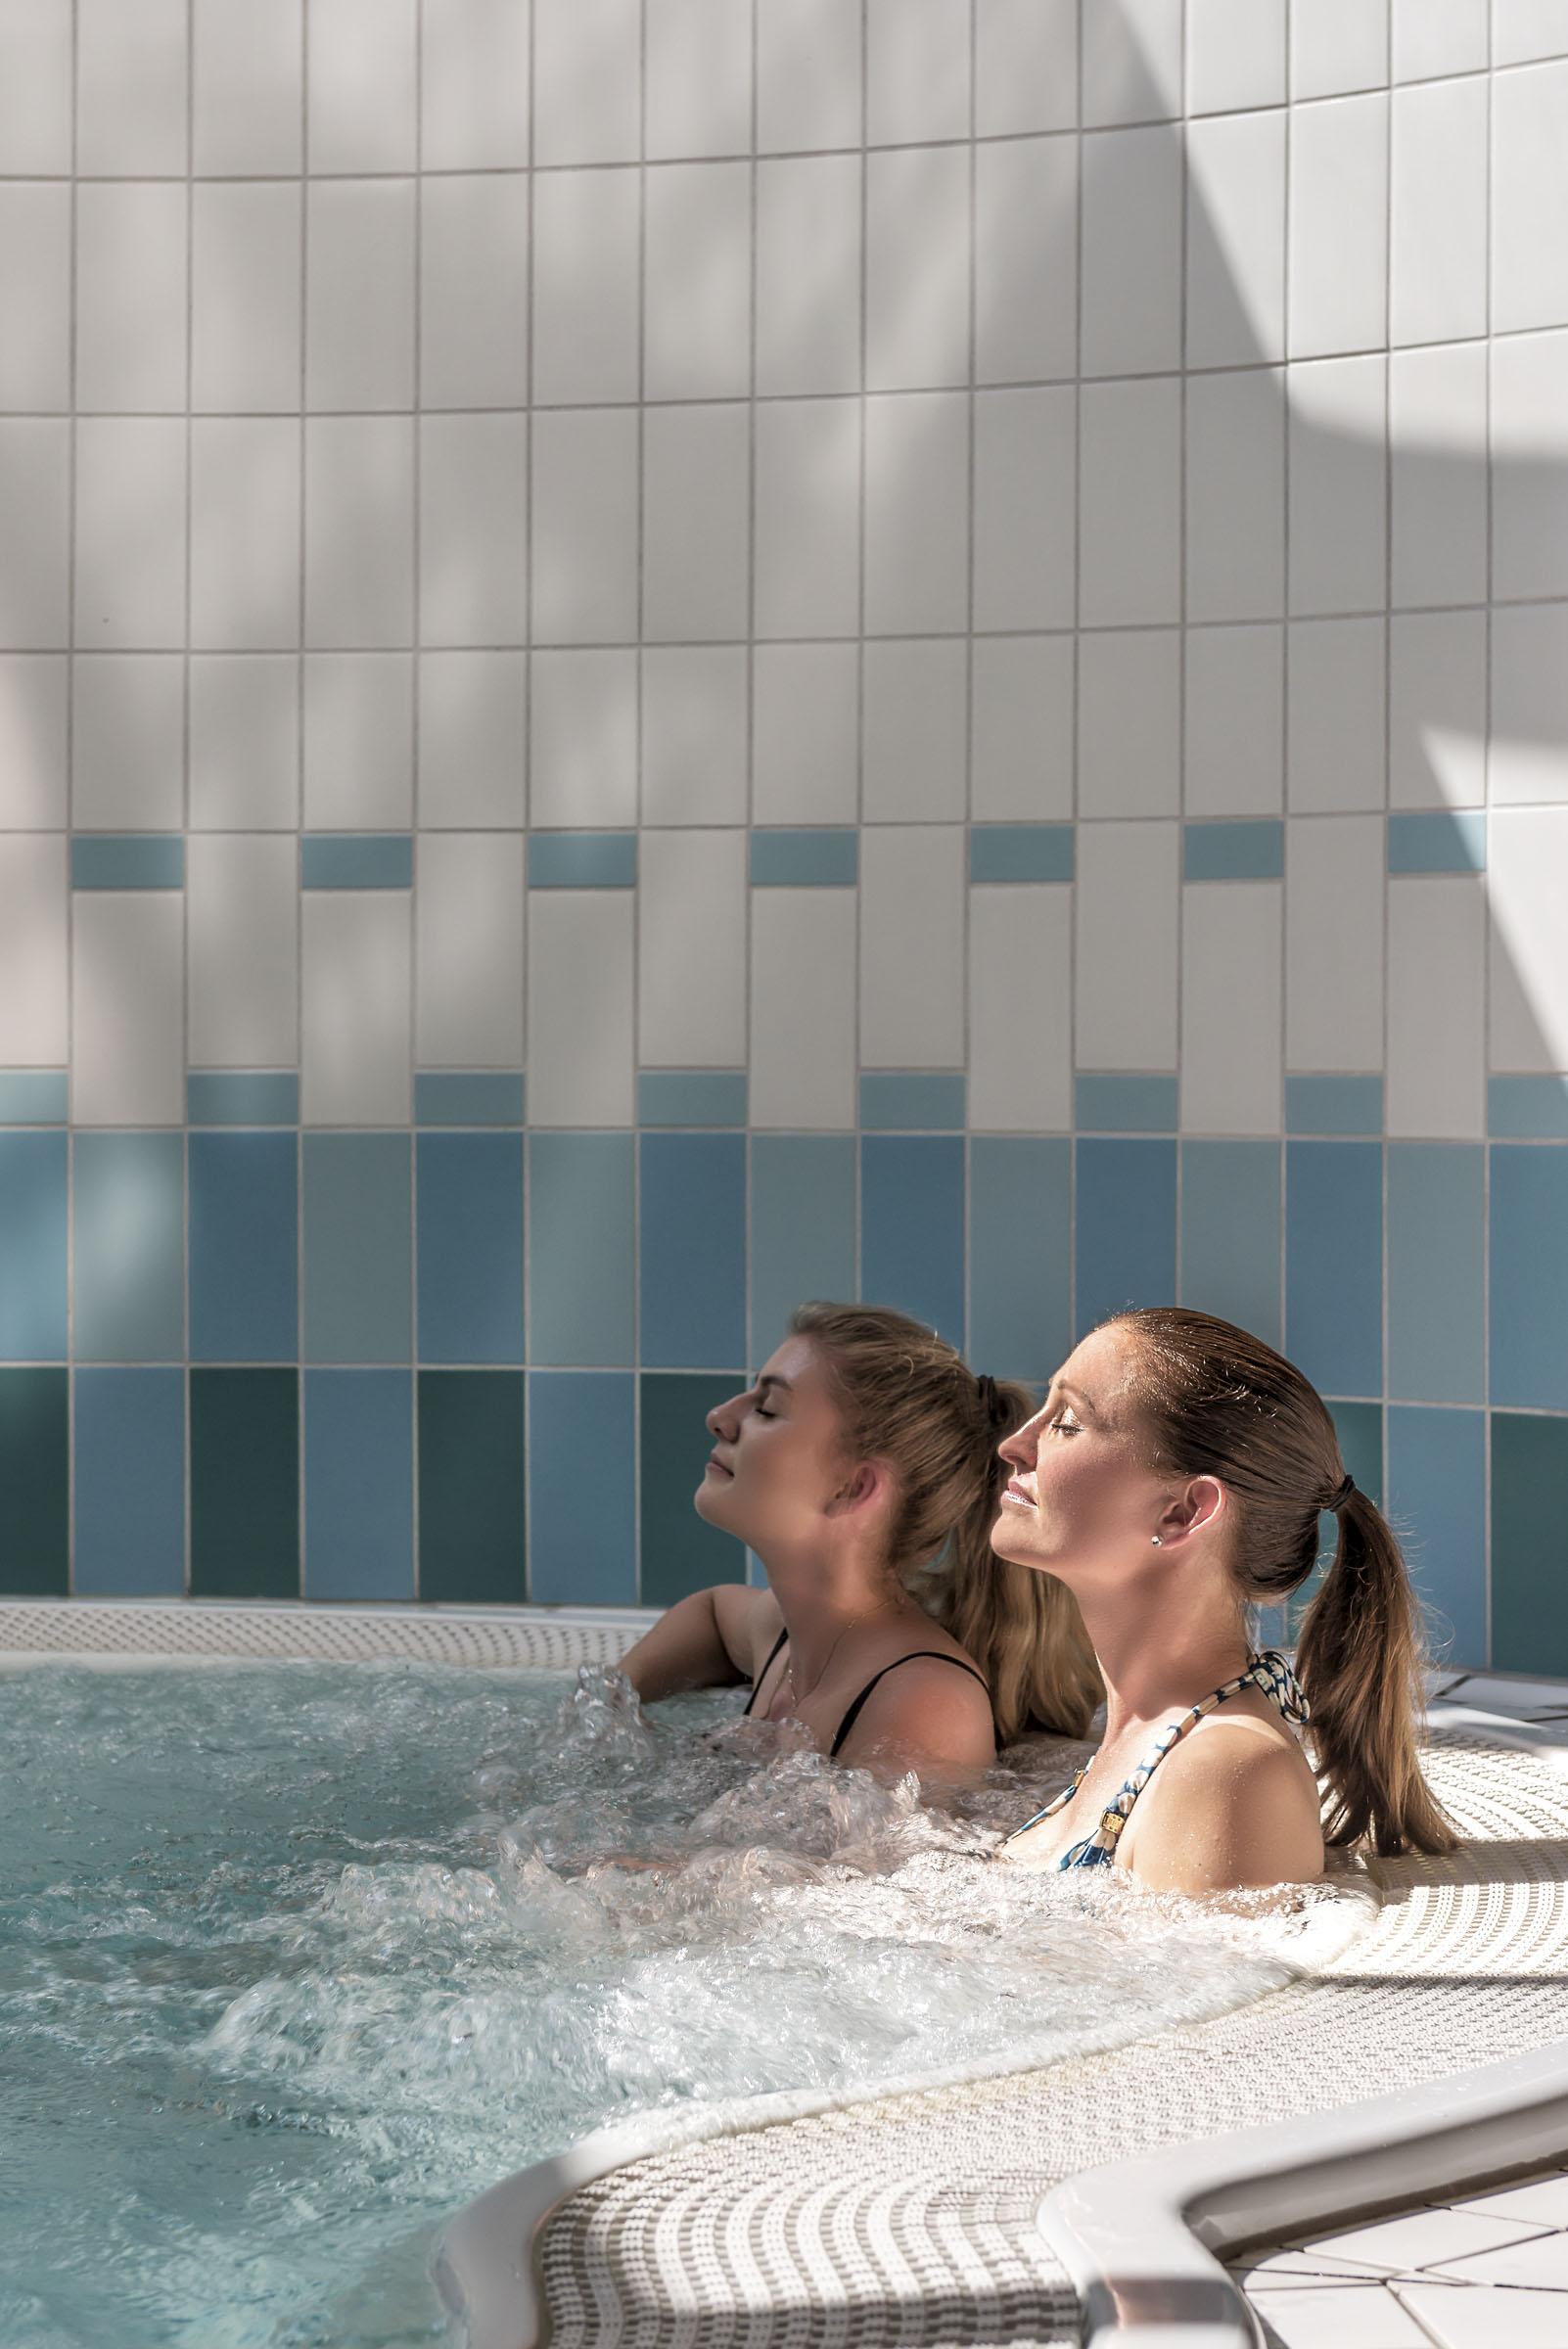 Holmen_Fjordhotell_Spa_2.jpg